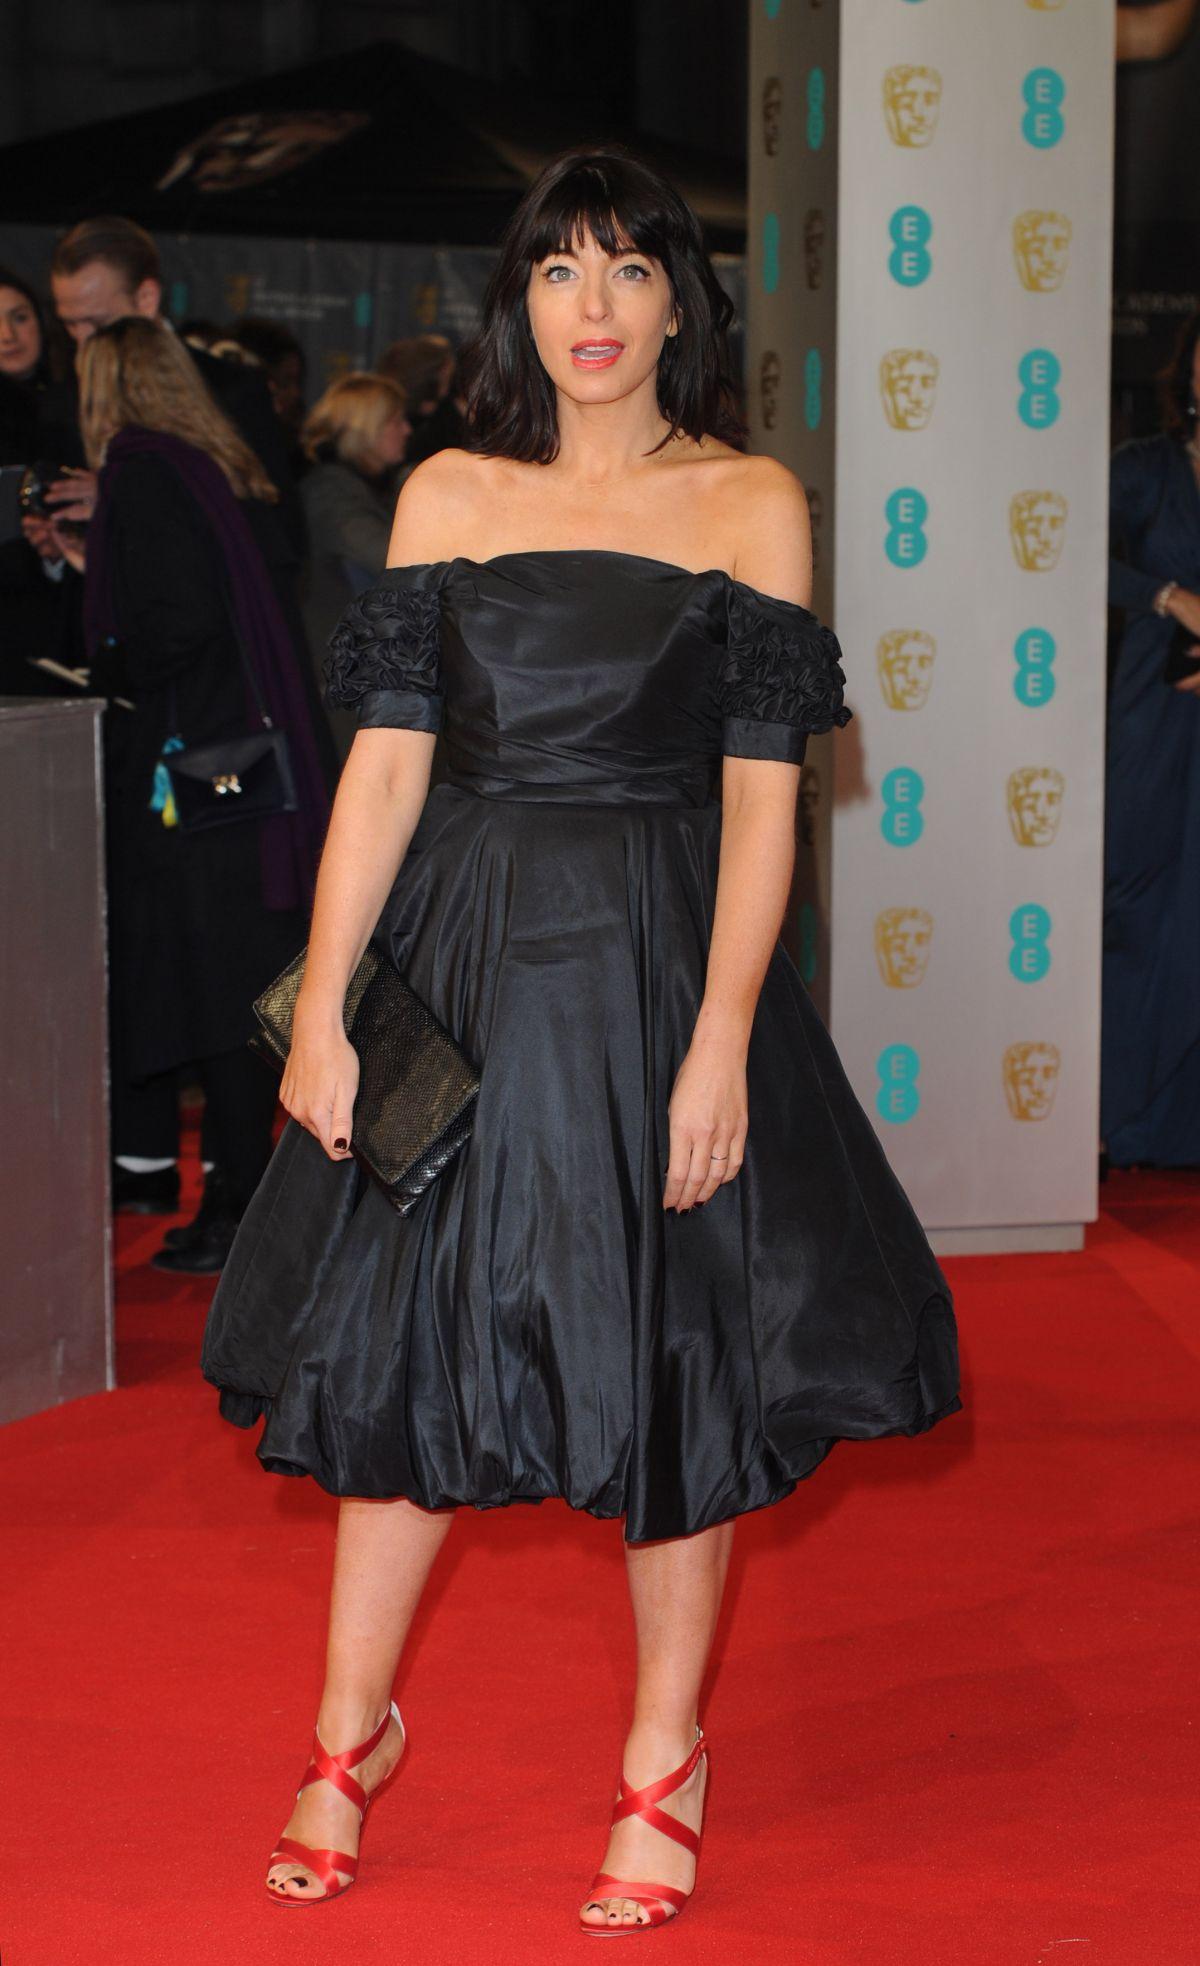 CLAUDIA WINKLEMAN at 2015 EE British Academy Film Awards in London